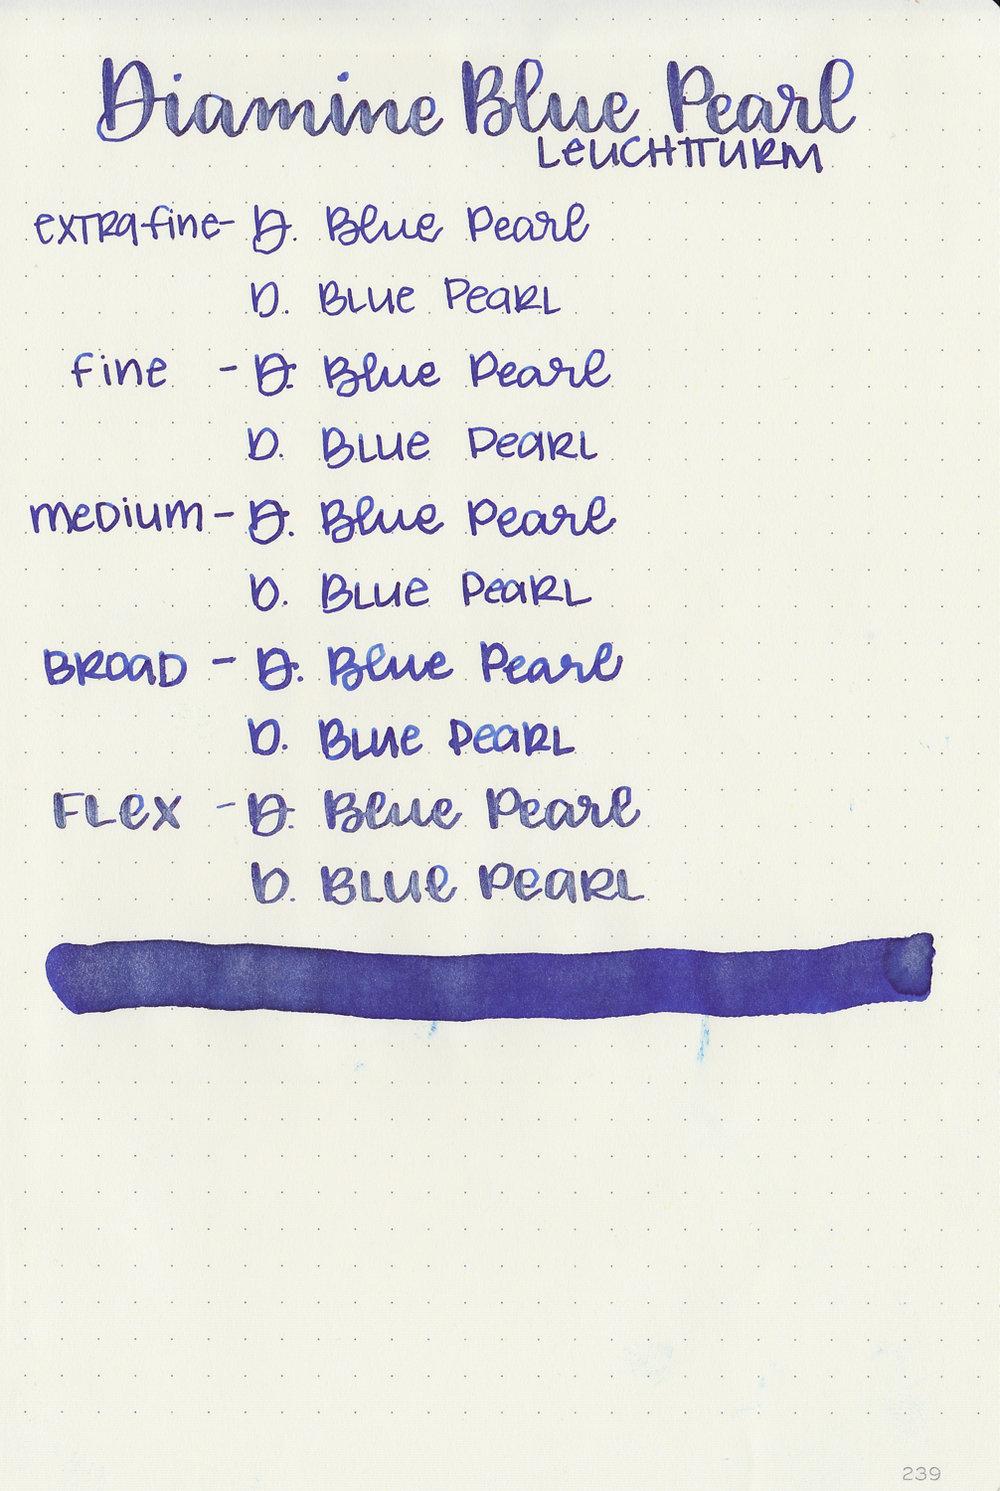 d-blue-pearl-9.jpg